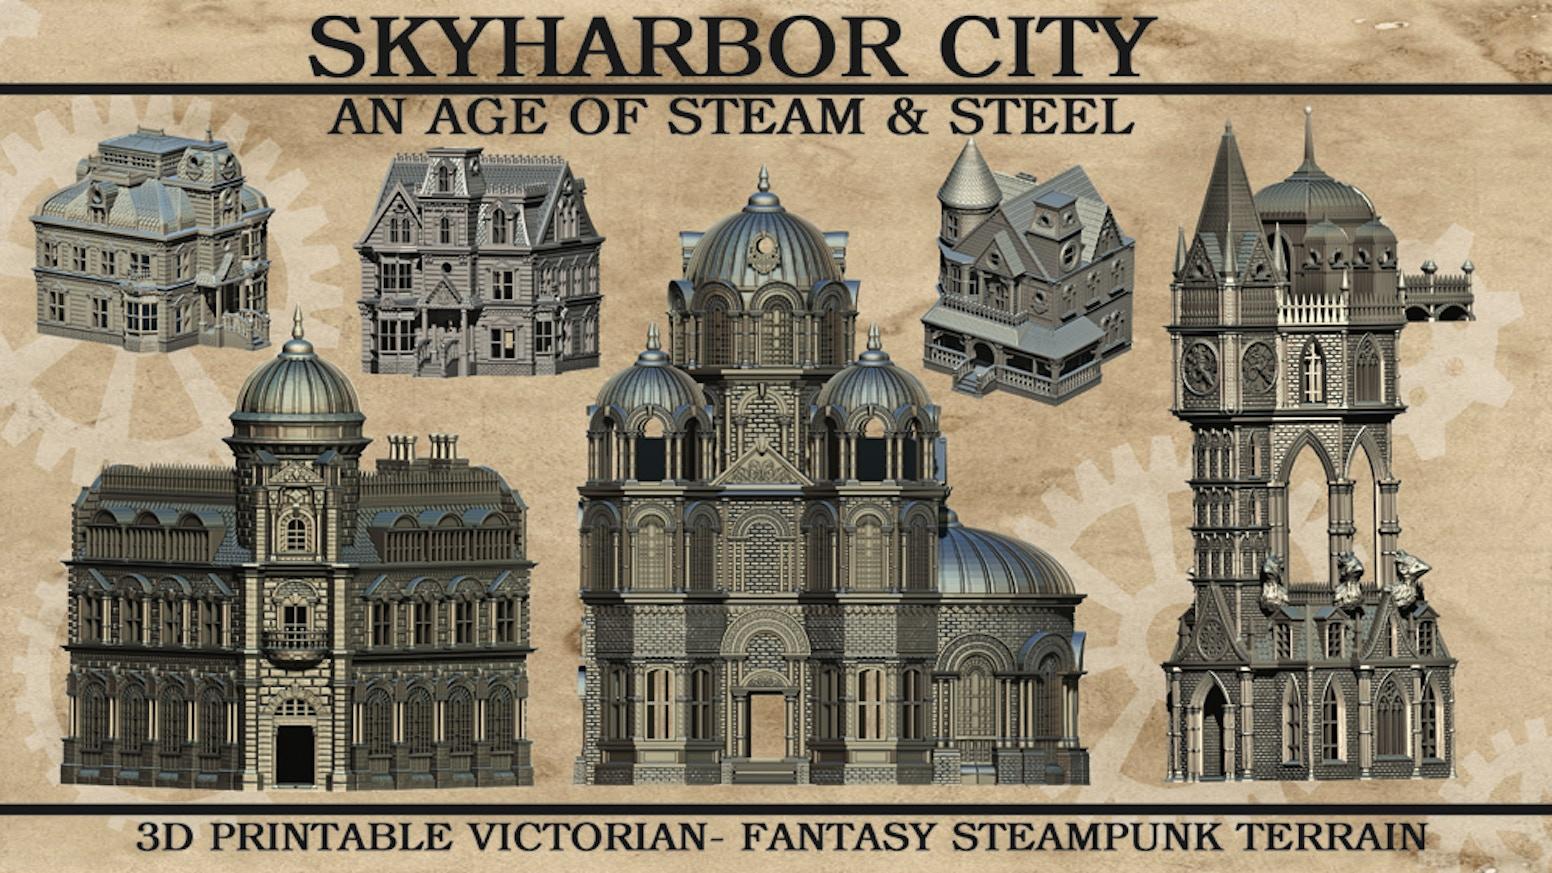 3D printable tabletop STL terrain pieces for Victorian era and Steampunk fantasy games.